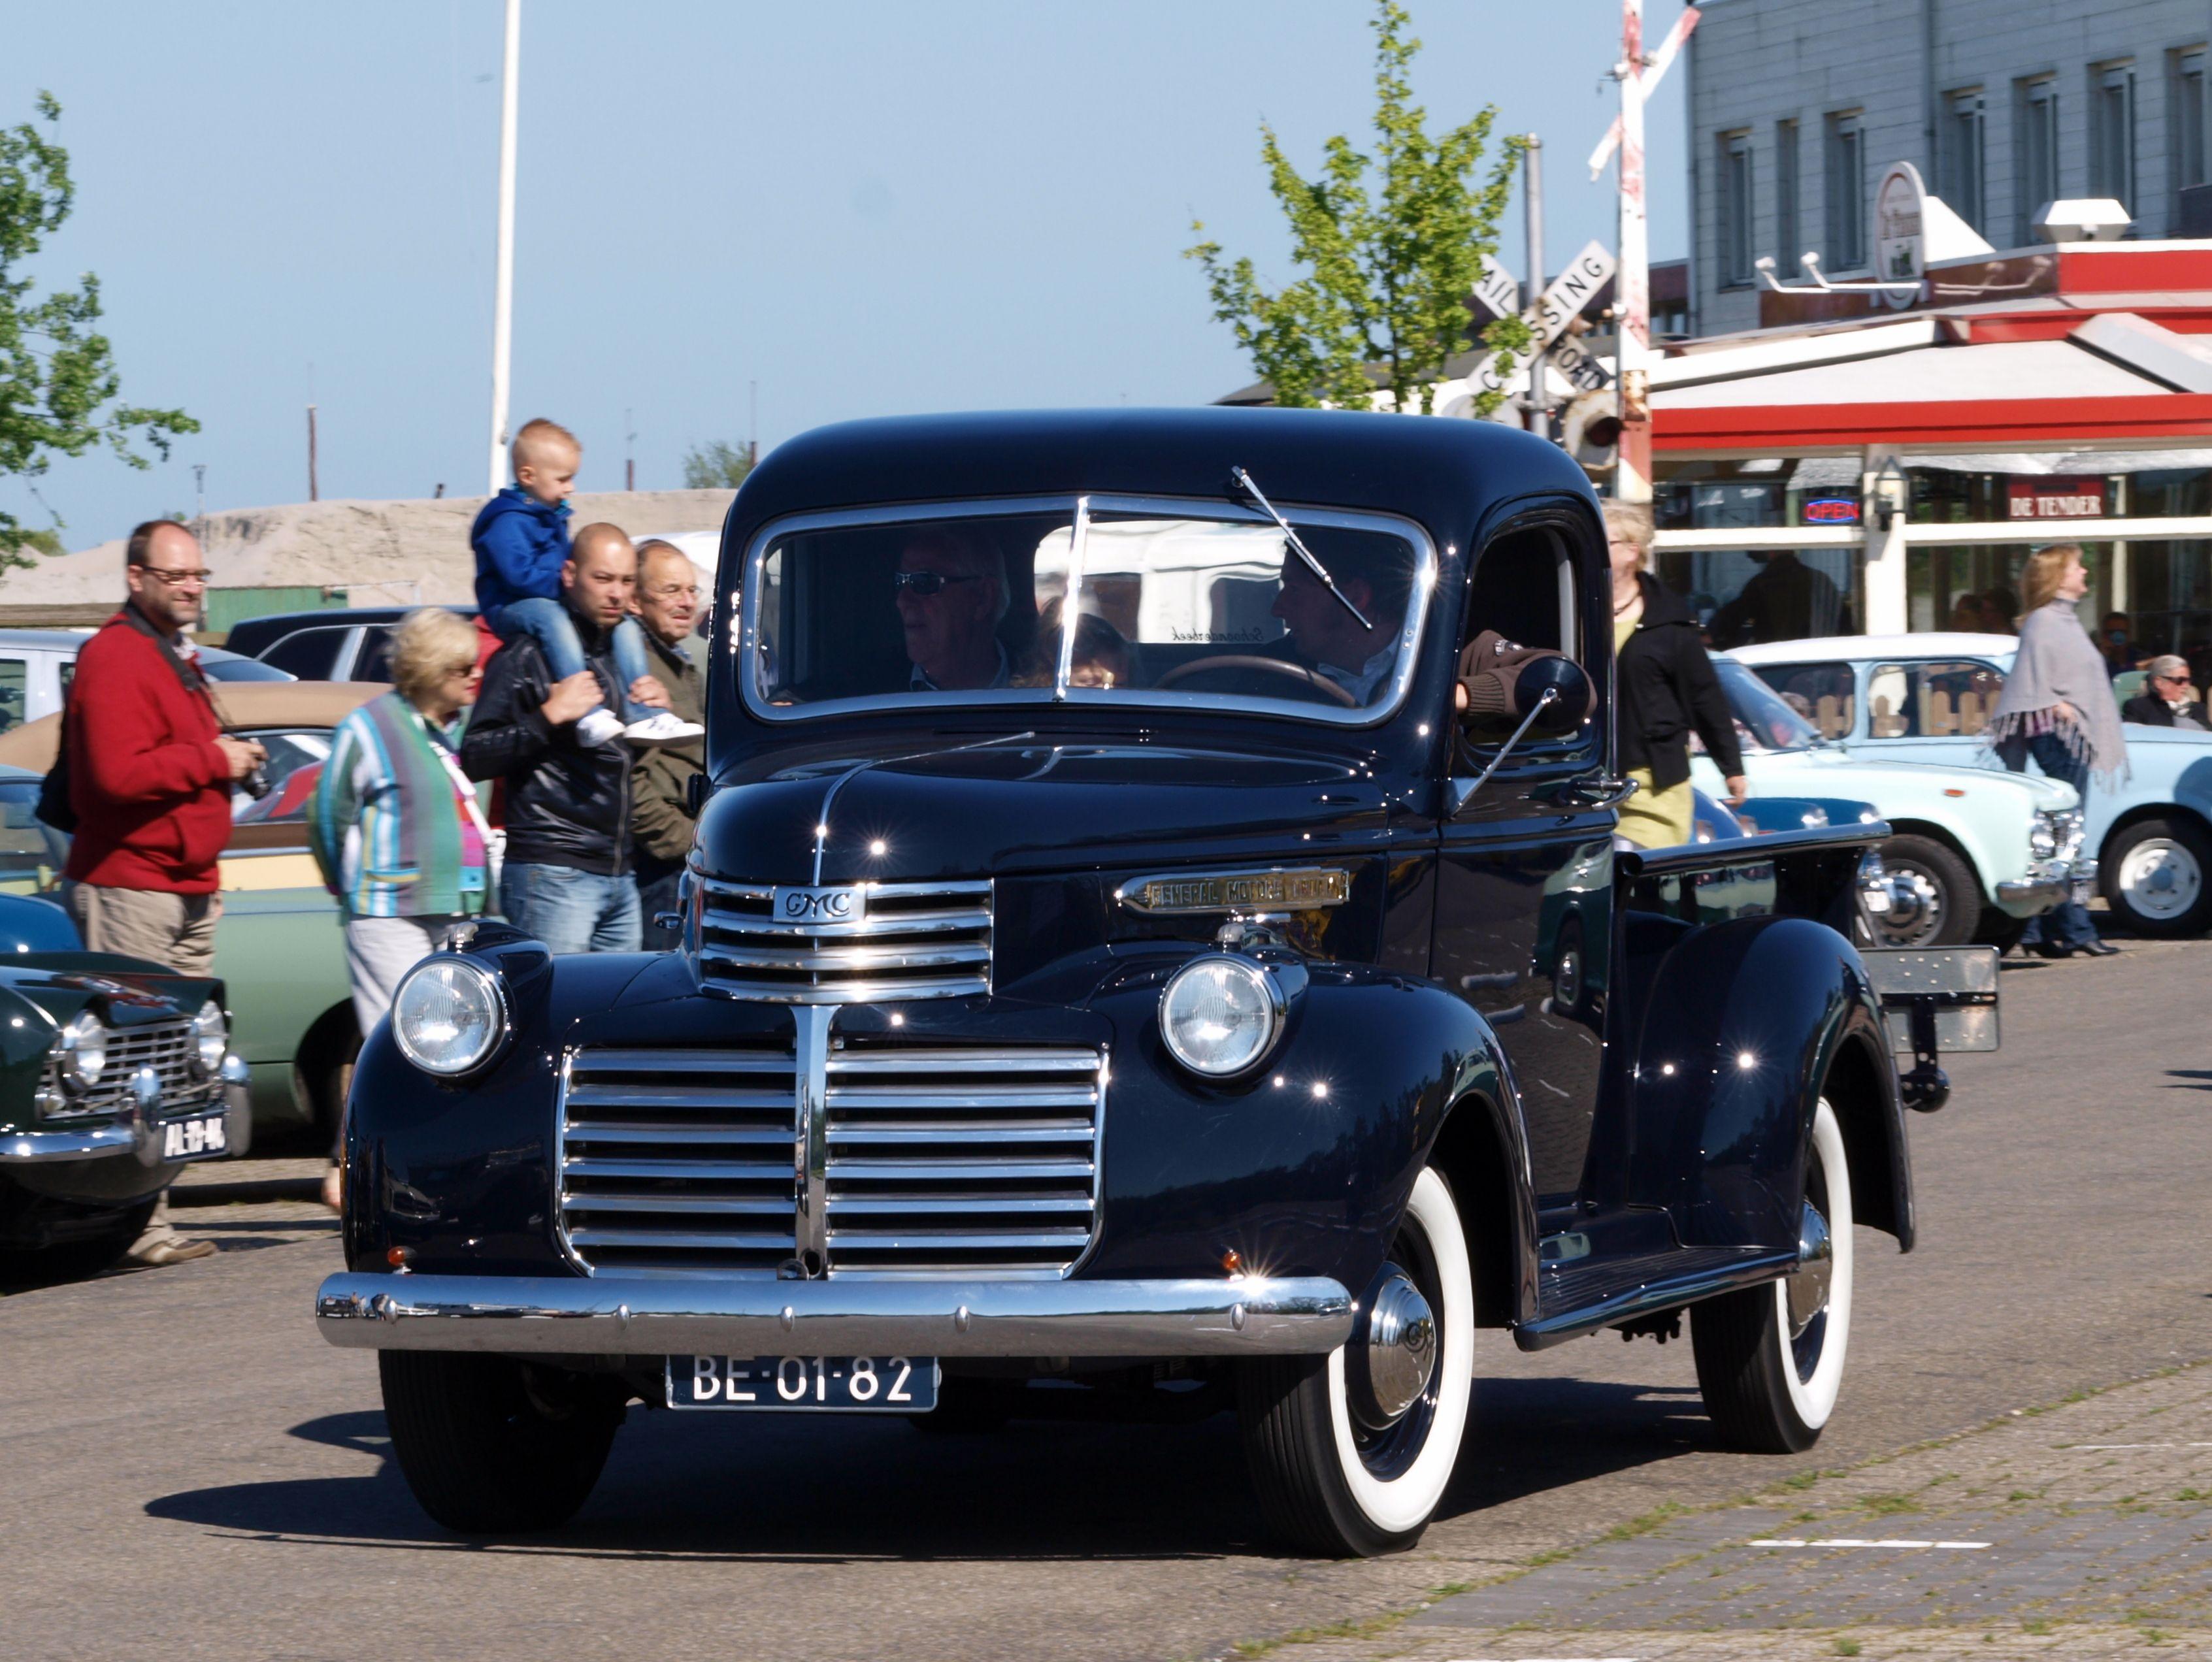 1941 GMC Model 9314 | Gmc vehicles, Old pickup trucks ...